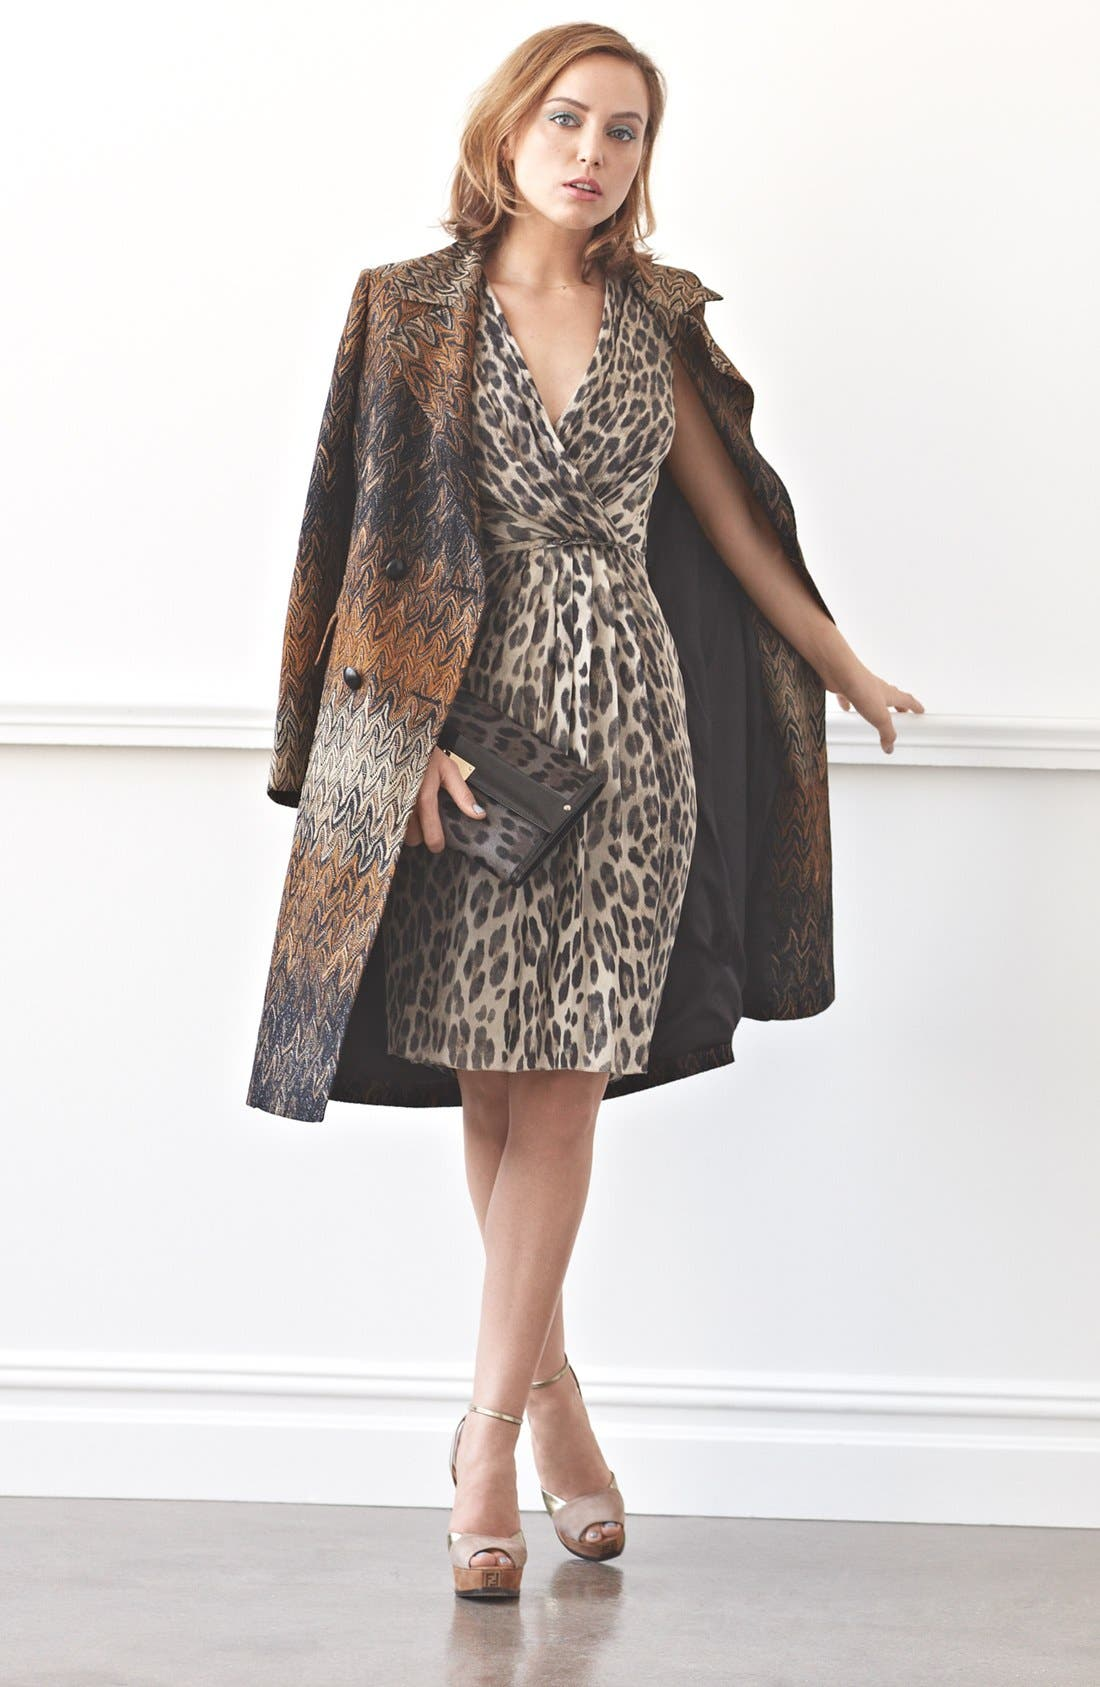 Main Image - Missoni Coat & L'AGENCE Dress